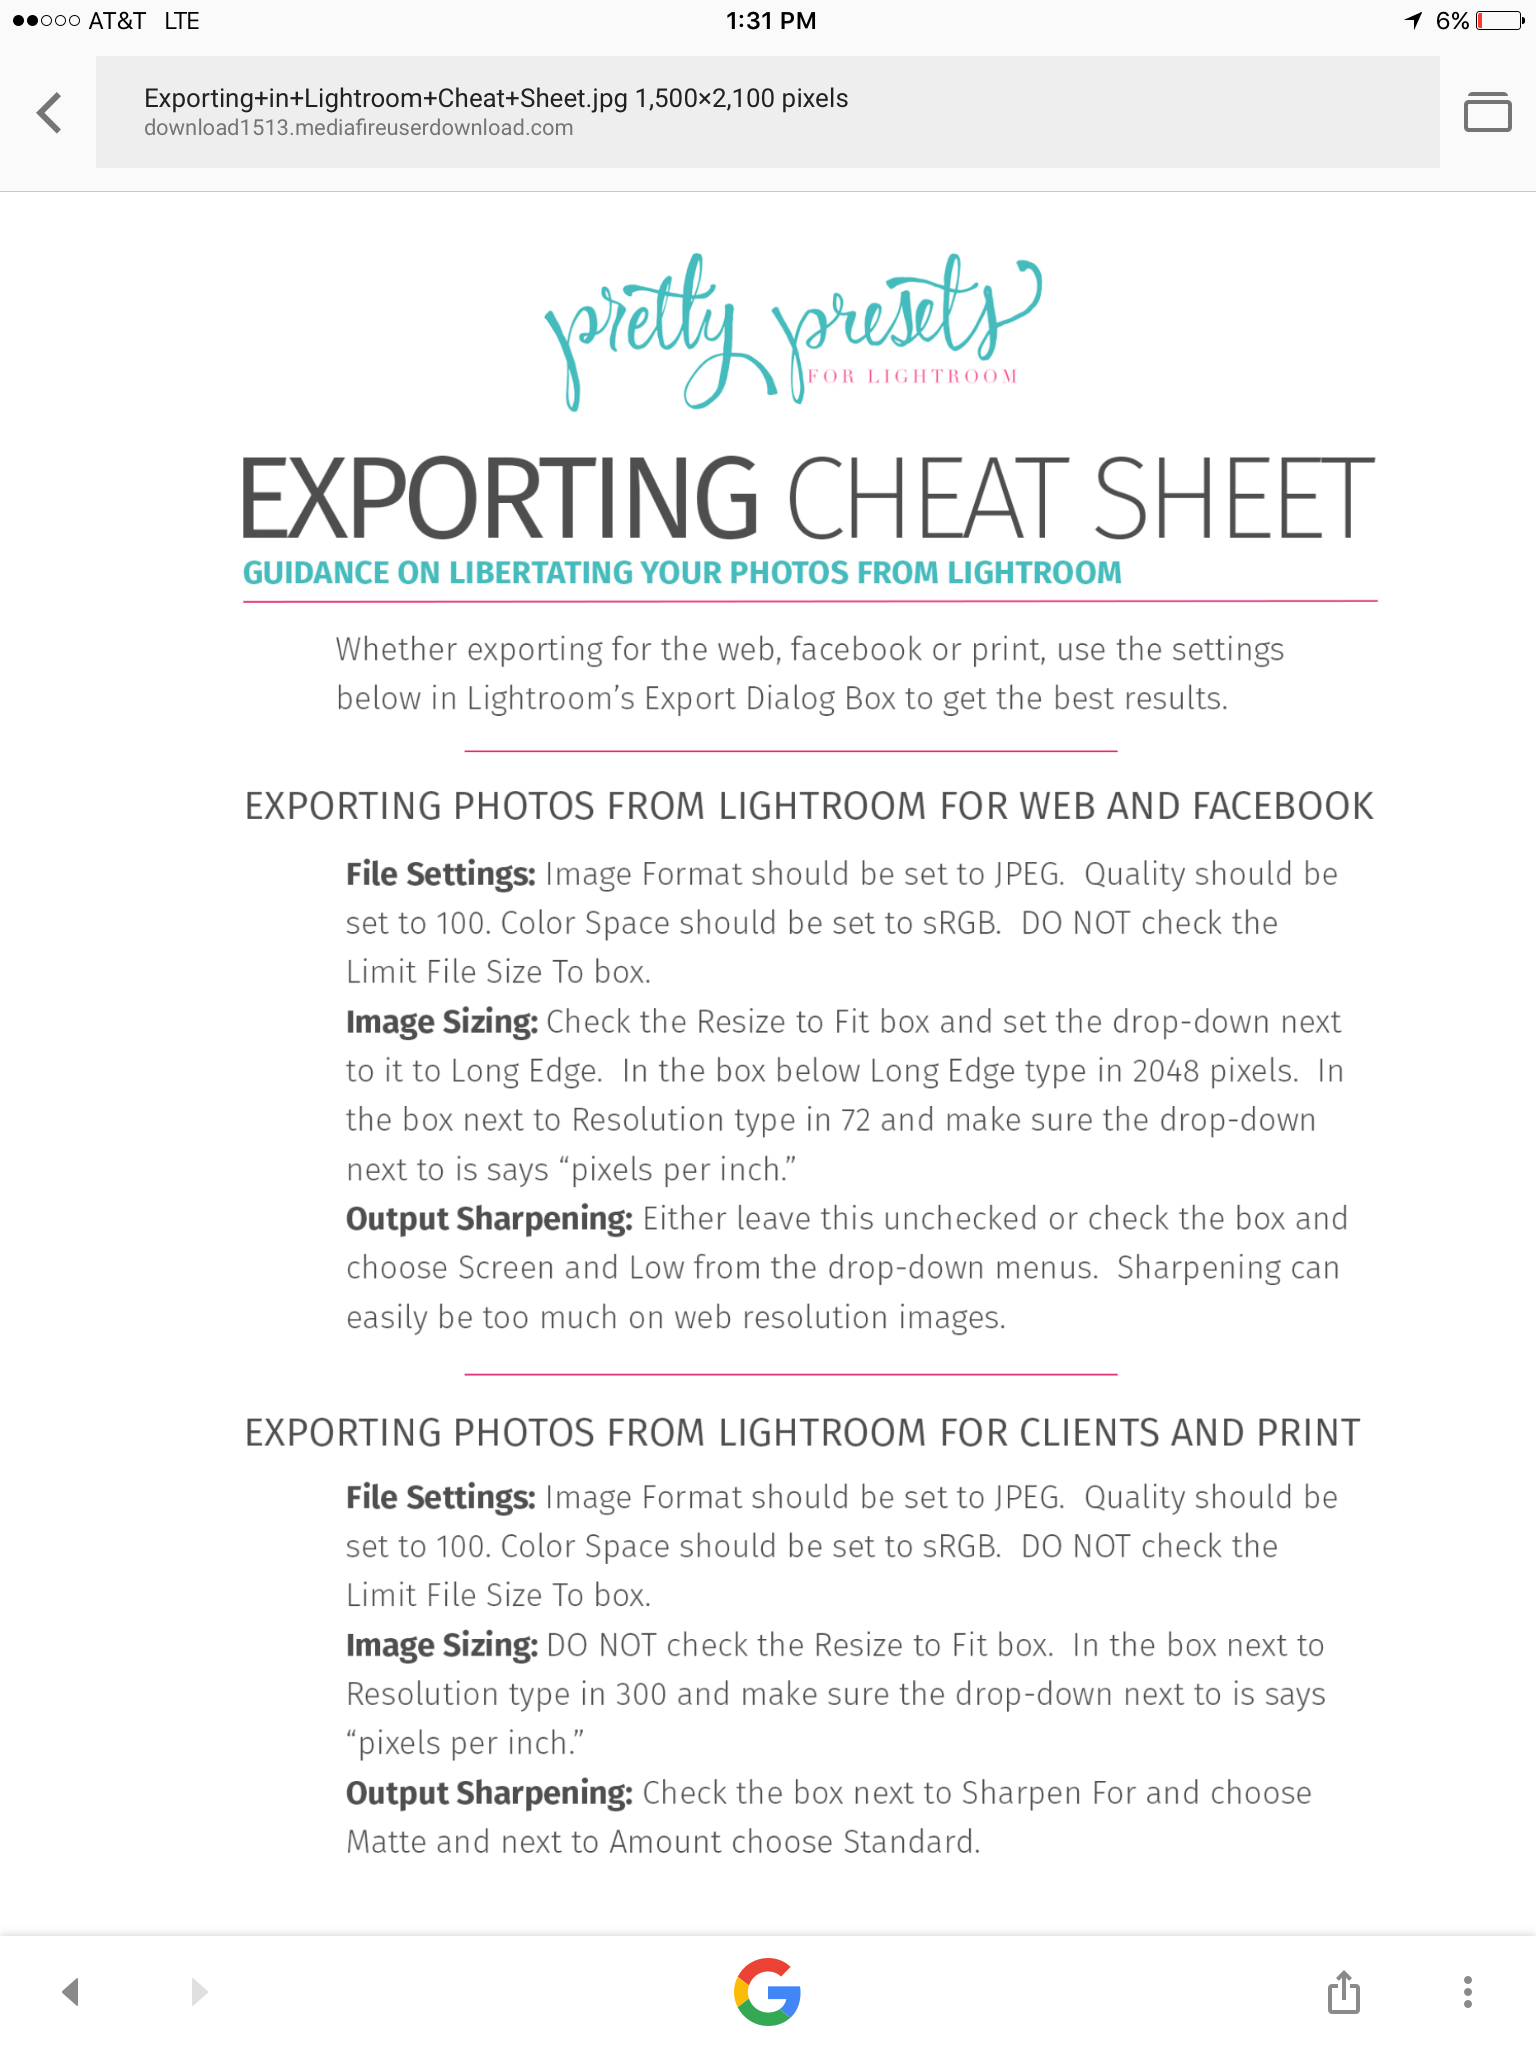 Lightroom export settings for web